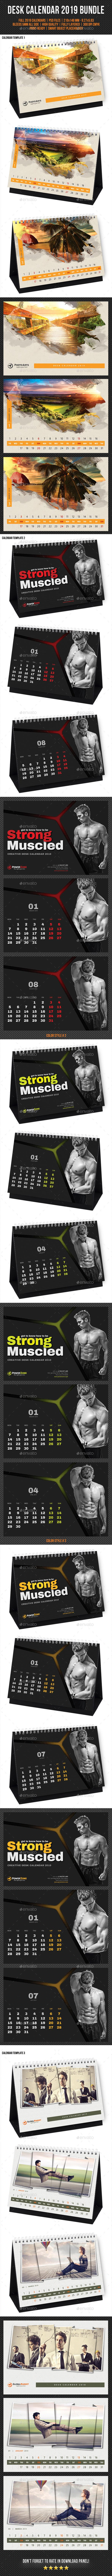 Creative Desk Calendar 2019 Bundle 07 - Calendars Stationery